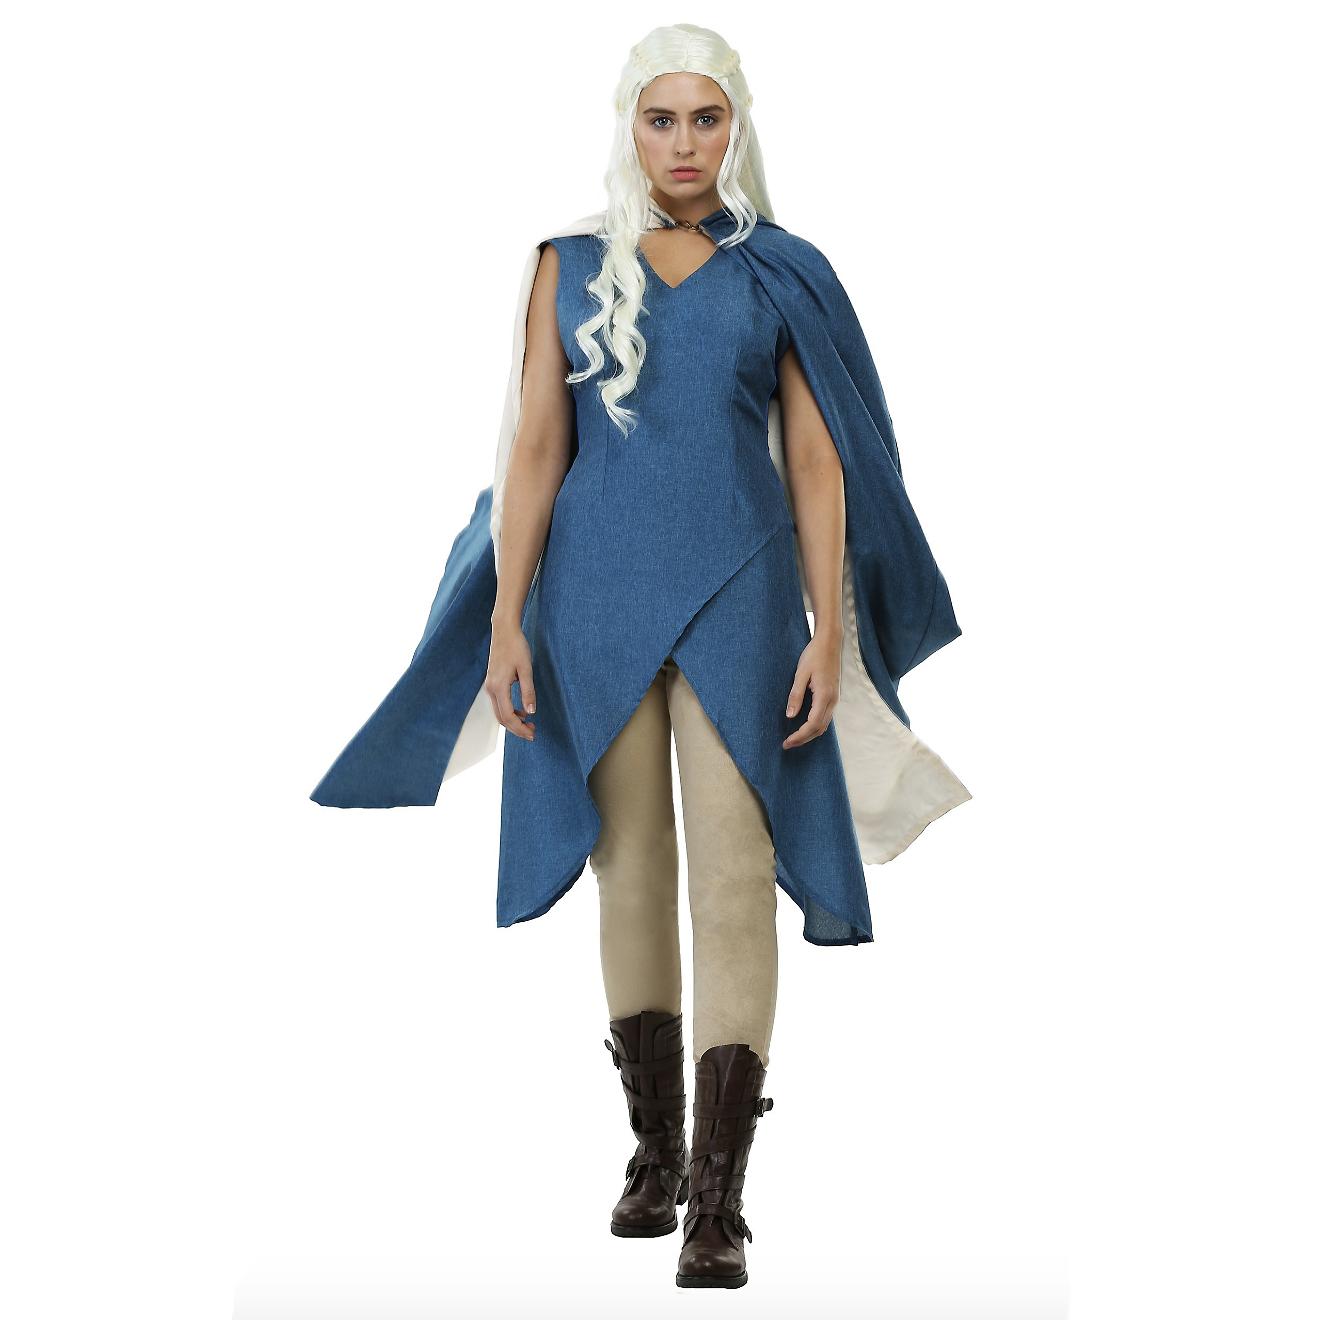 daenery-halloween-costume.png